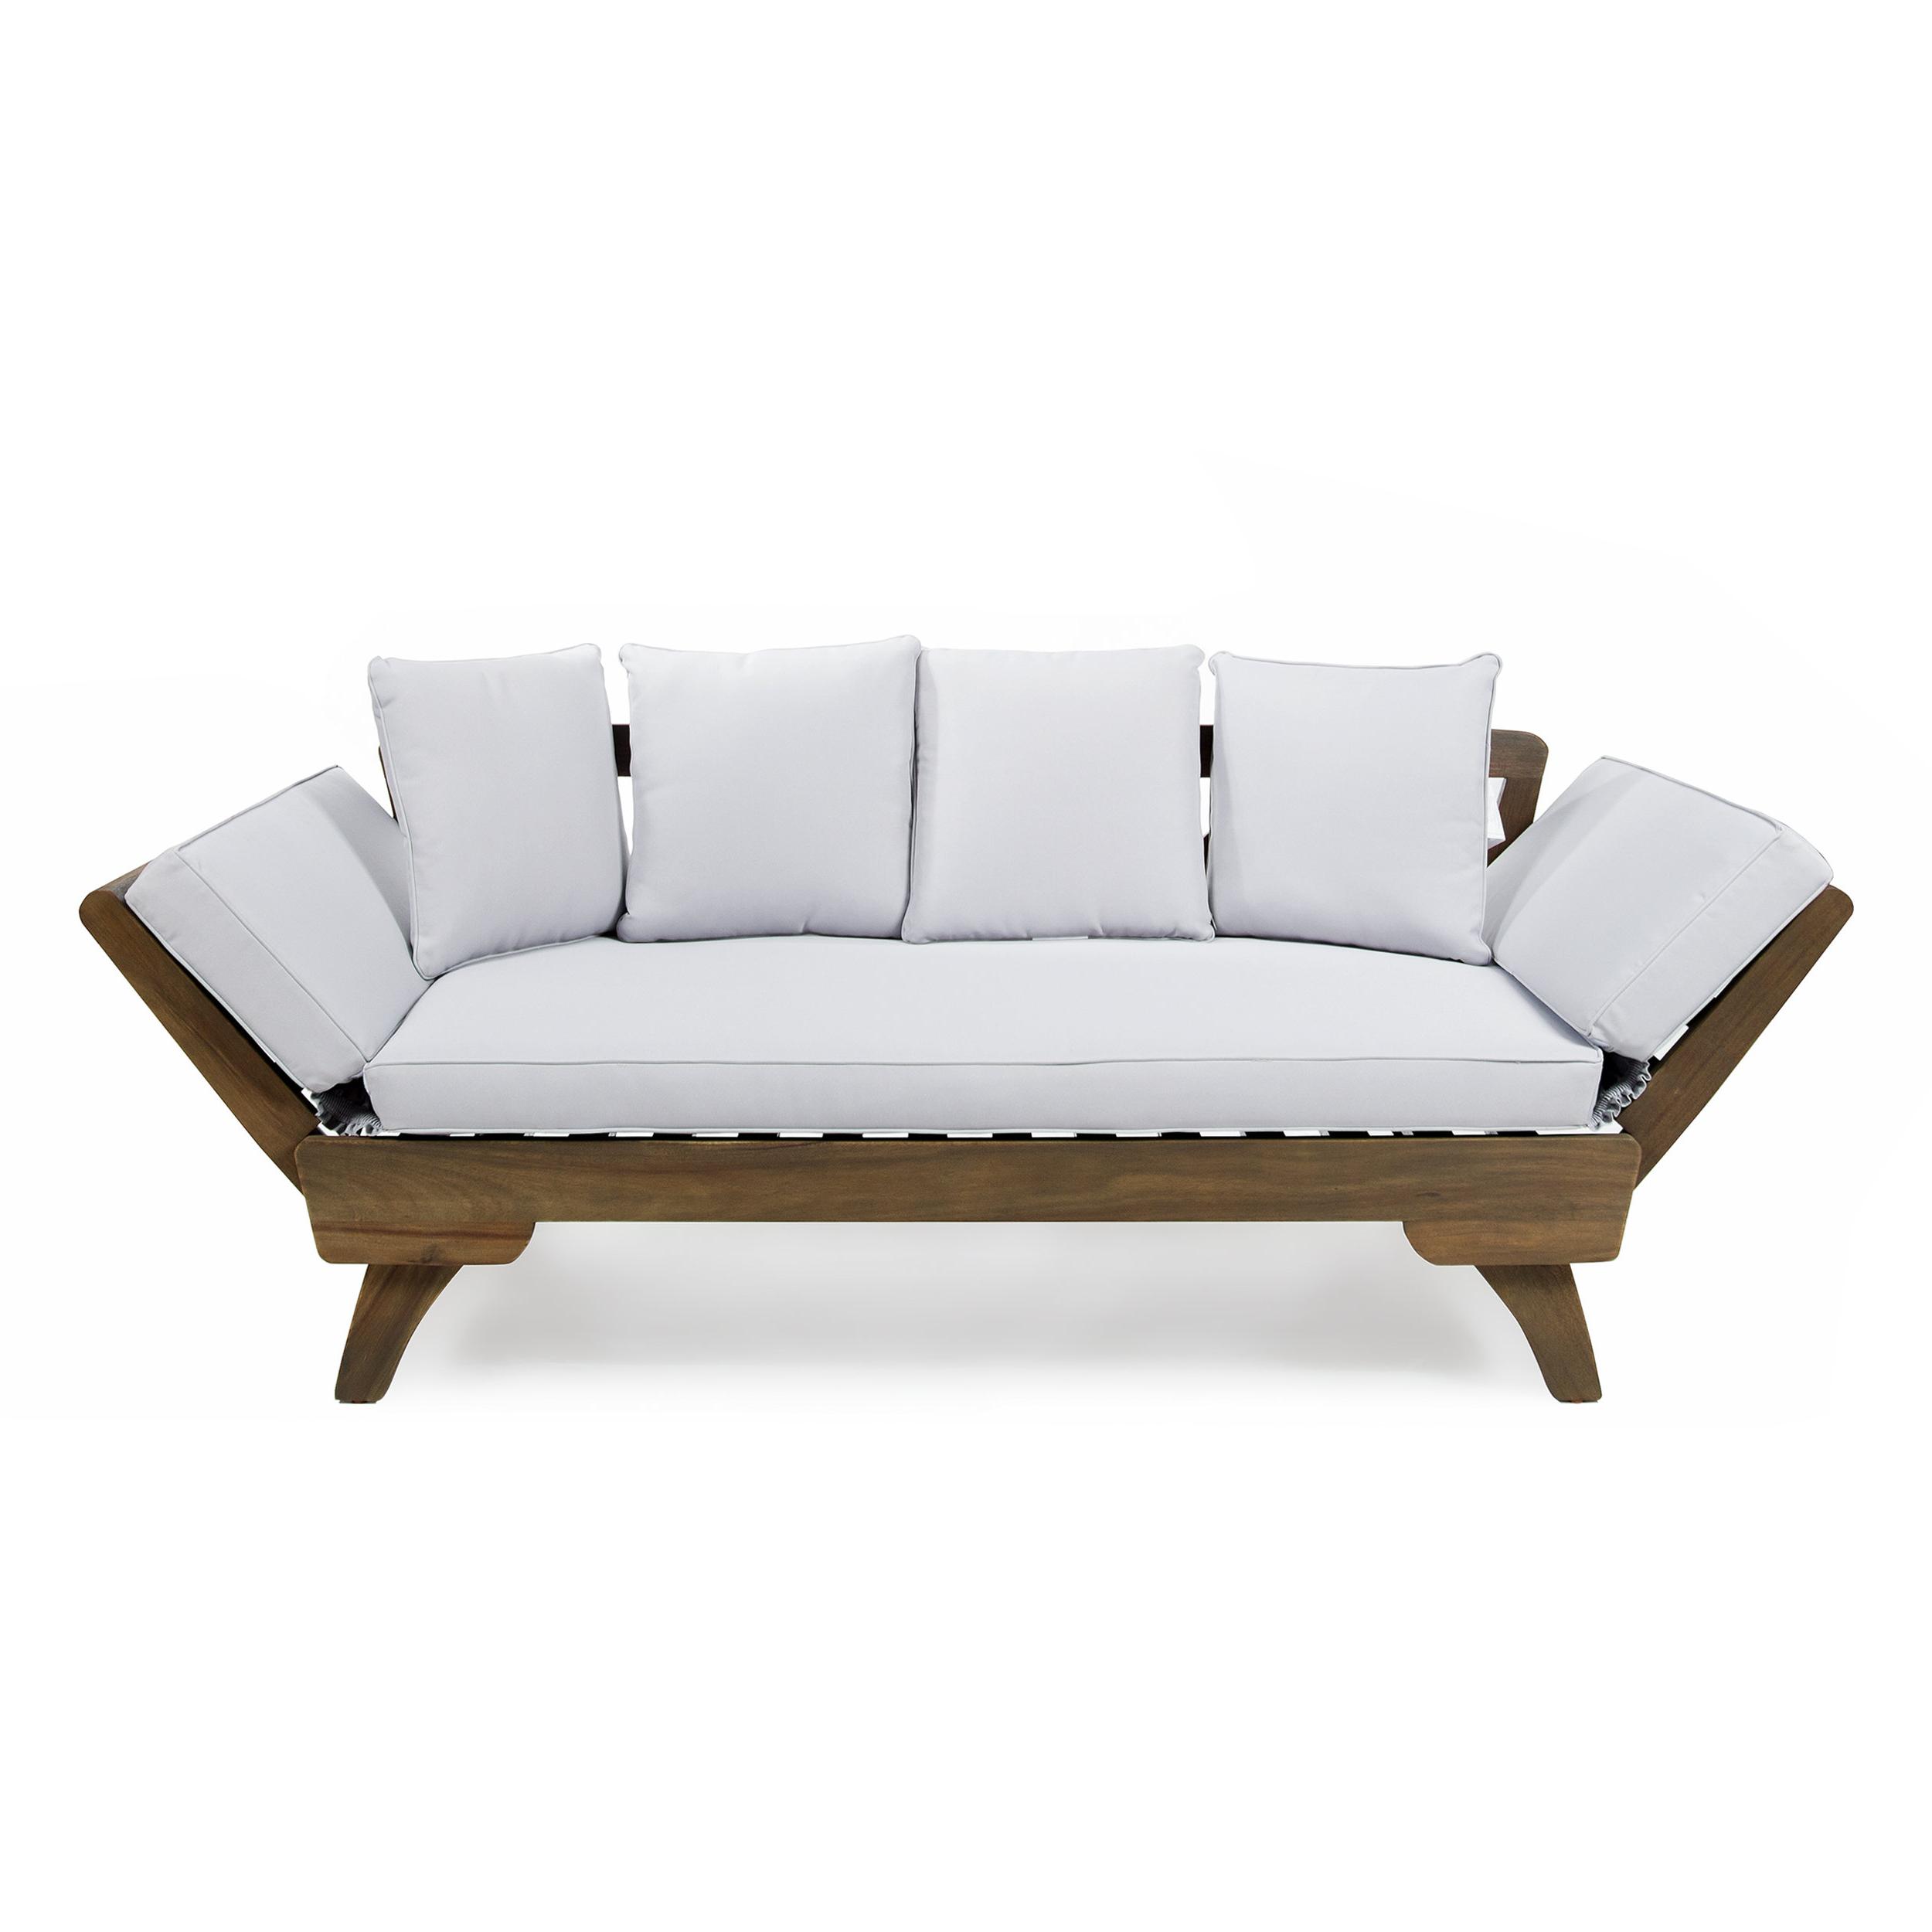 Lavina Outdoor Patio Daybeds With Cushions Regarding Most Popular Union Rustic Ellanti Teak Patio Daybed With Cushions (View 10 of 20)